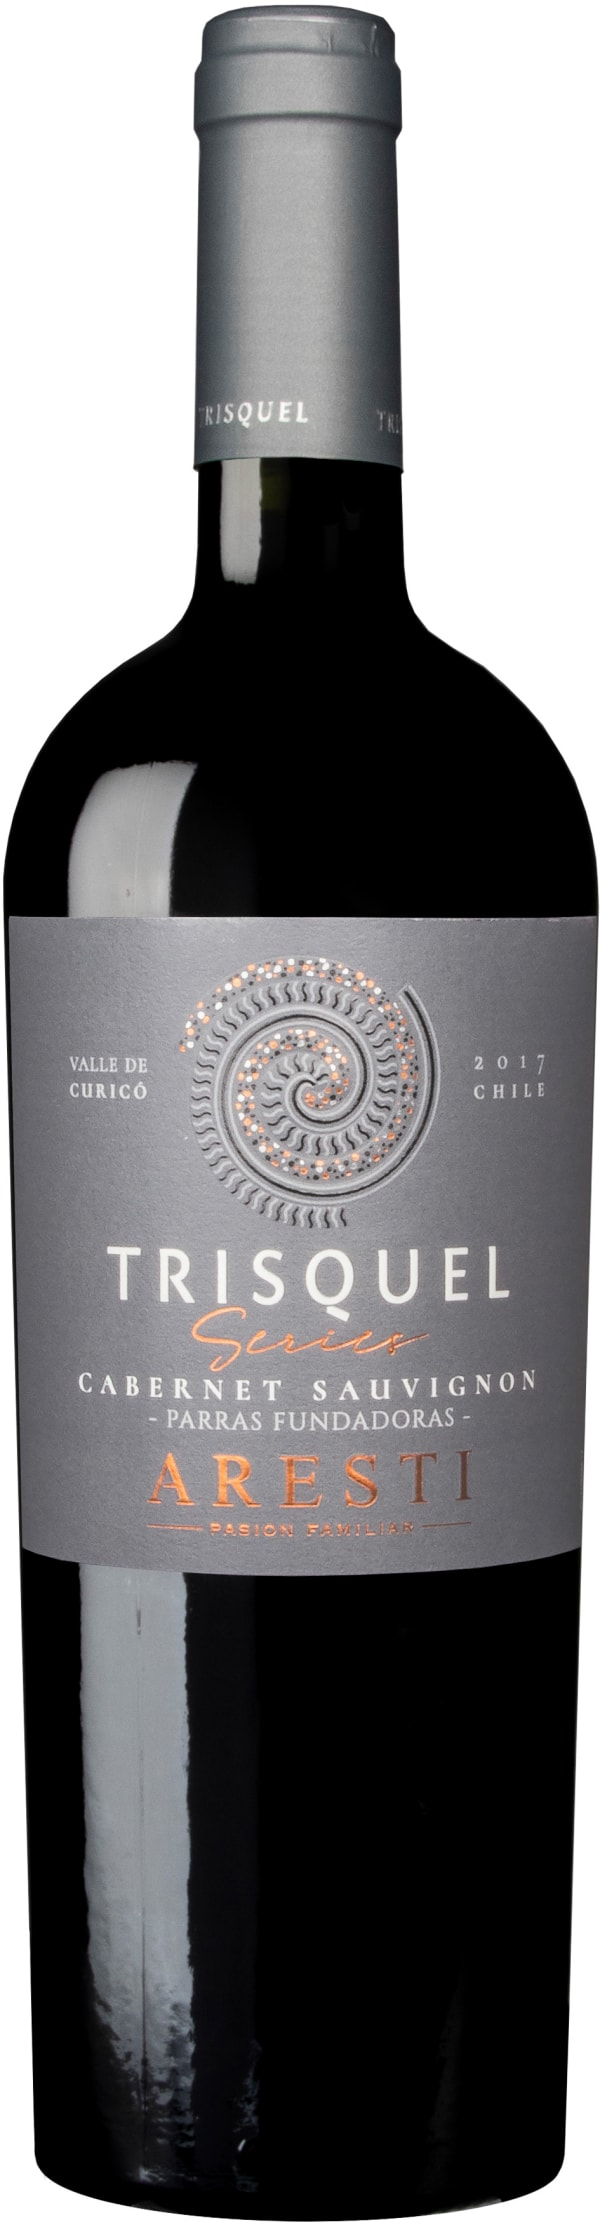 Trisquel  Series Cabernet Sauvignon 2017